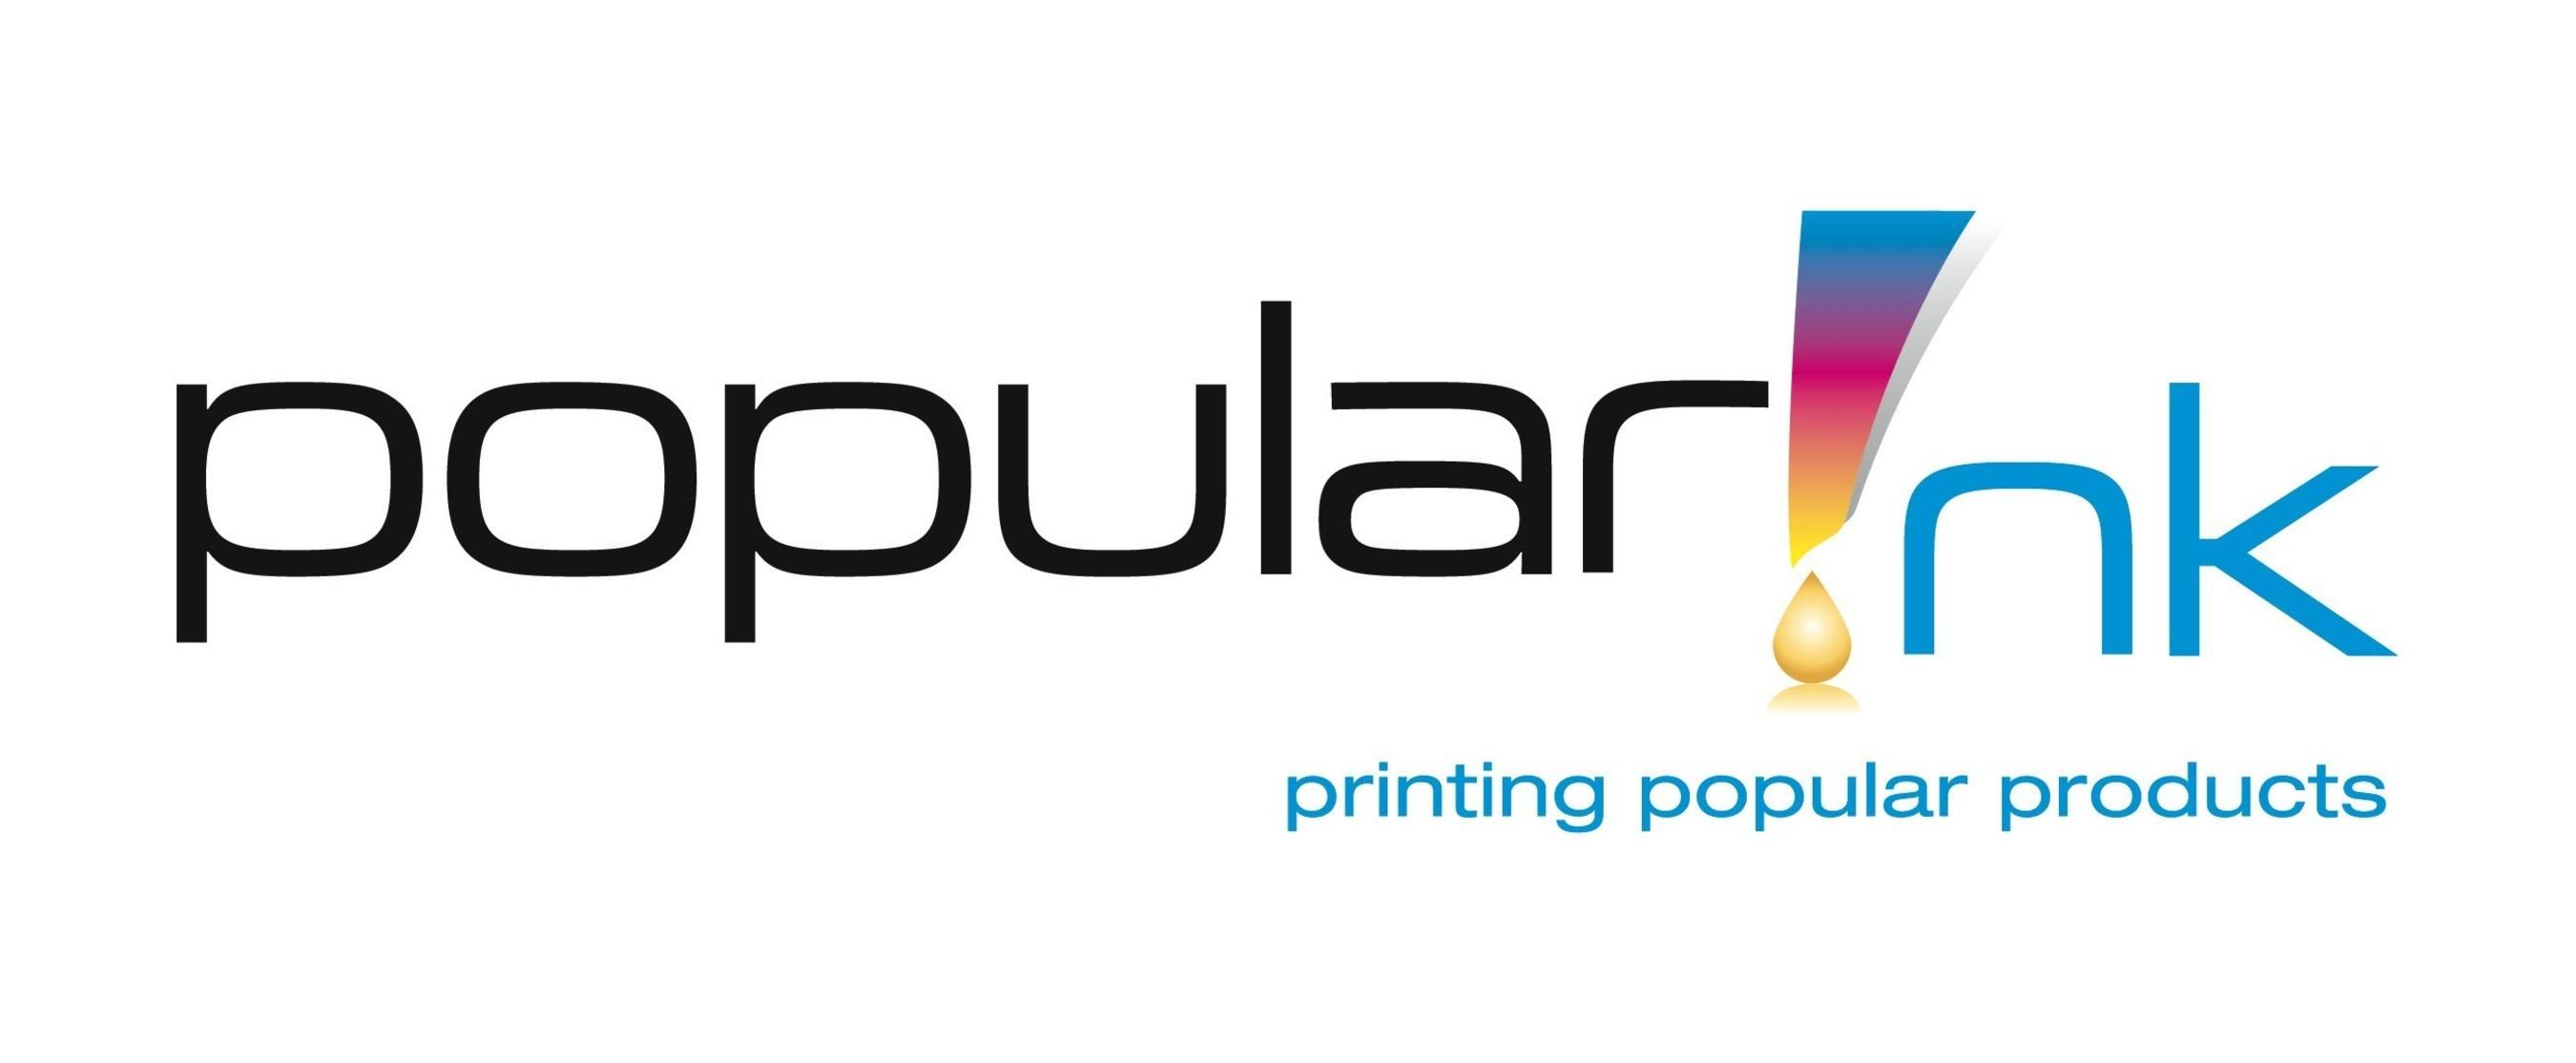 Popular Ink, LLC